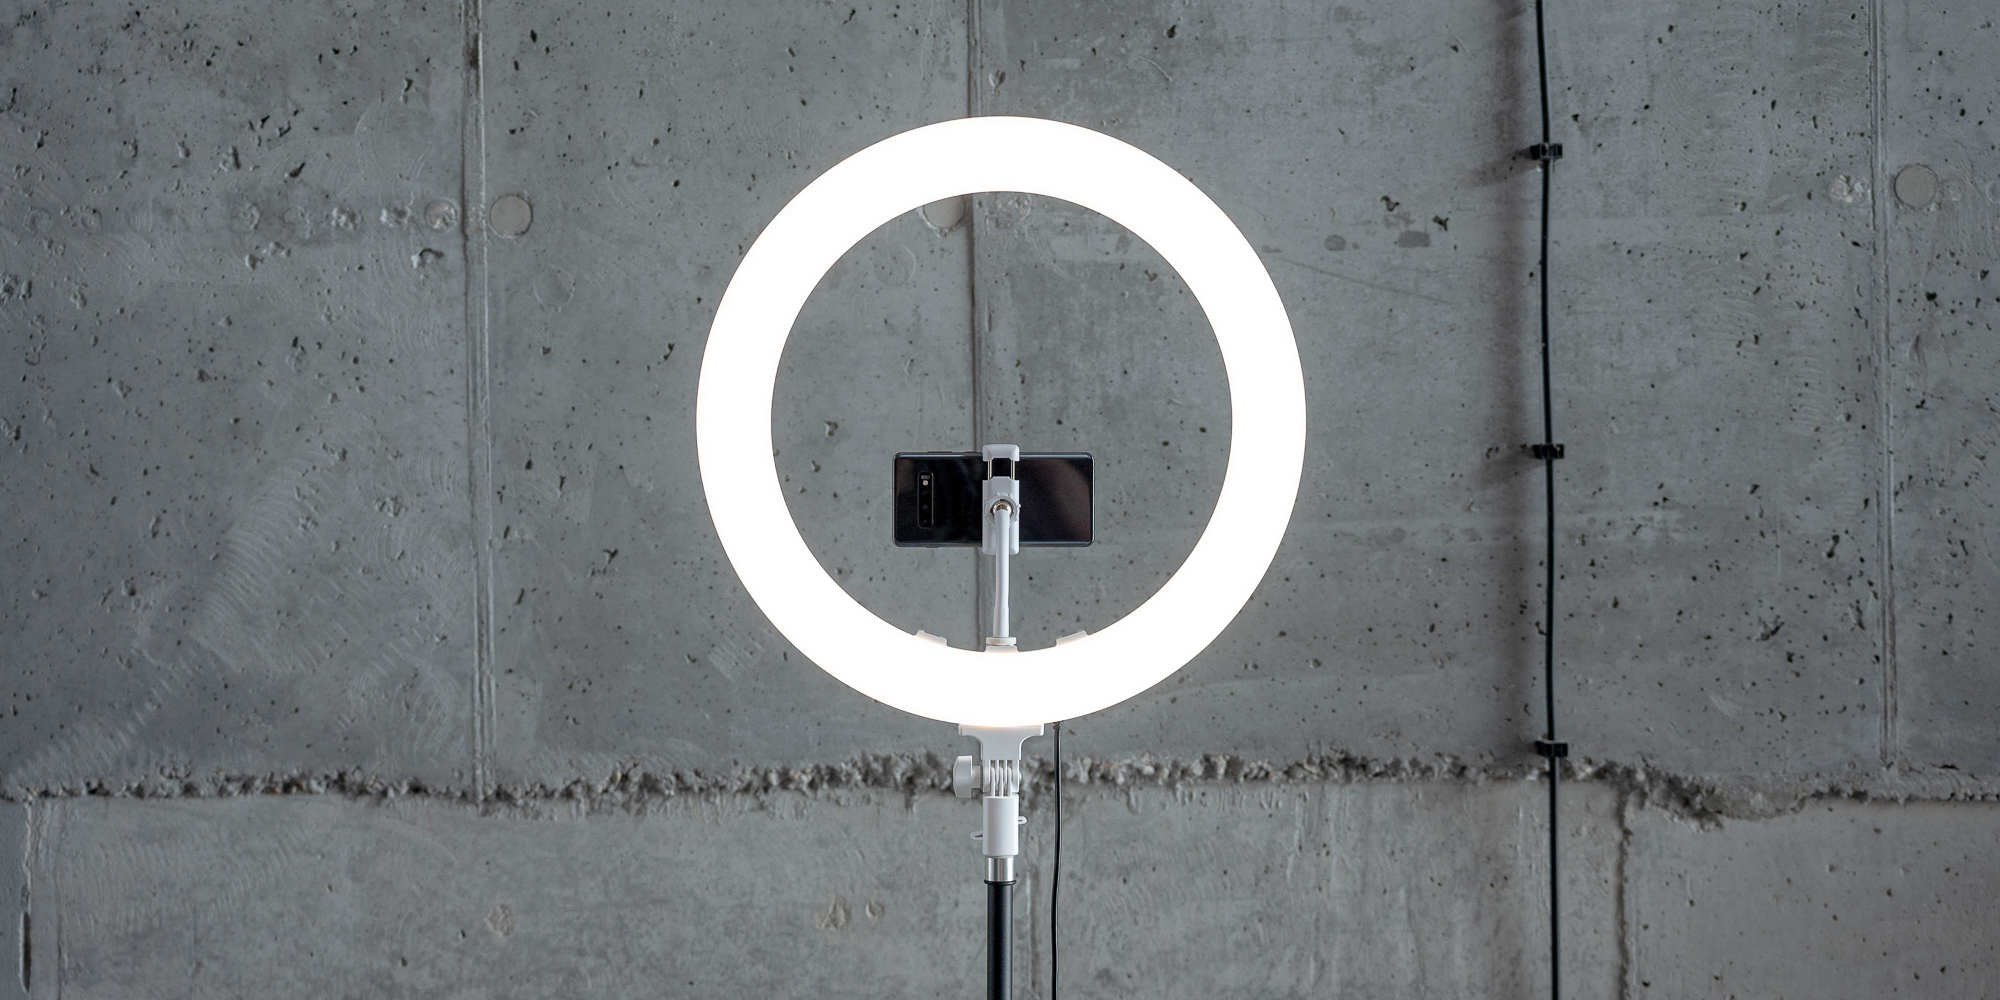 Lampa pierścieniowa LED Newell RL-18A - WB (3200 K - 5500 K) - Arctic White